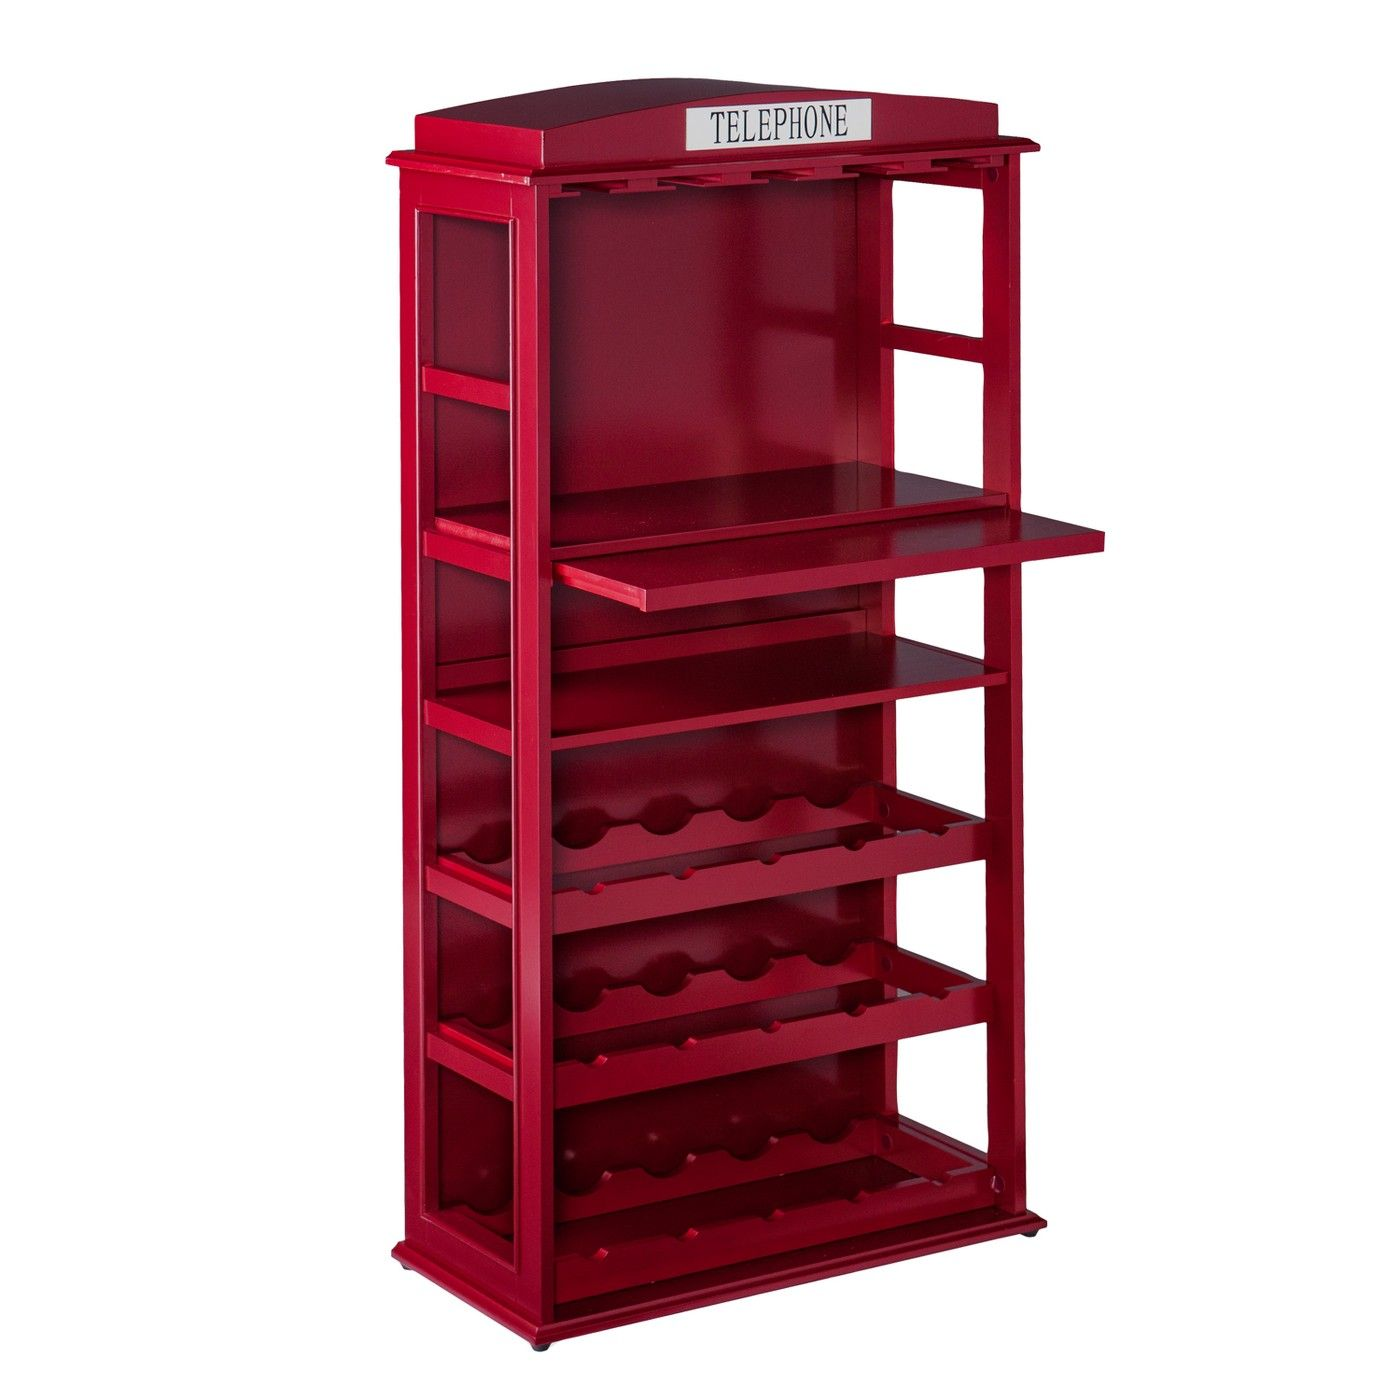 Phone Booth Bar Cabinet Wine Storage Deep Red Aiden Lane Image 2 Of 8 Wine Cabinets Bar Cabinet Wine Storage